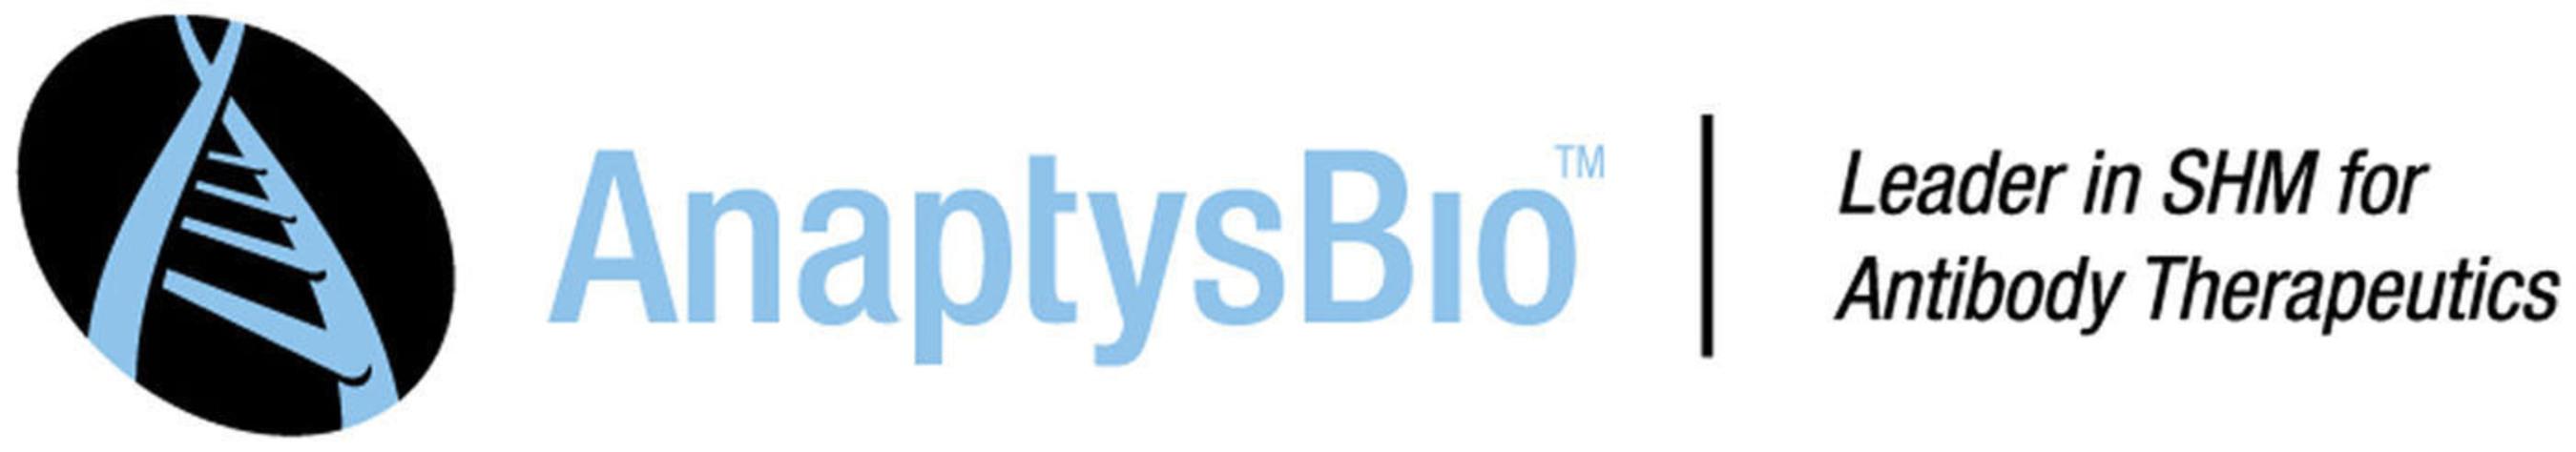 AnaptysBio Leader in SHM for Antibody Therapeutics www.anaptysbio.com.